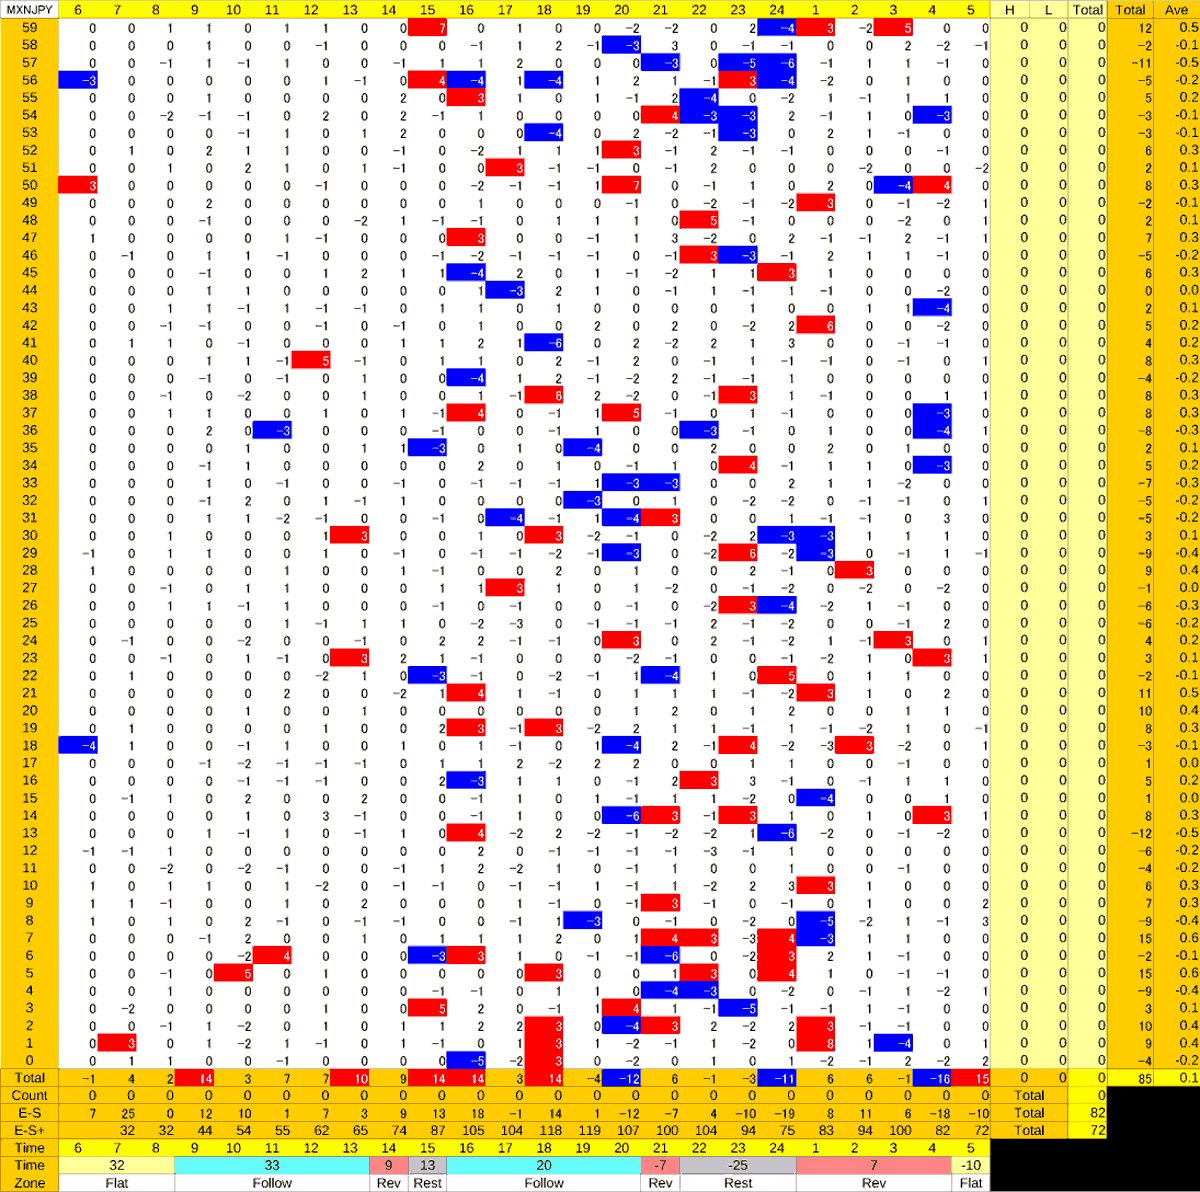 20200526HS(3)MXNJPY